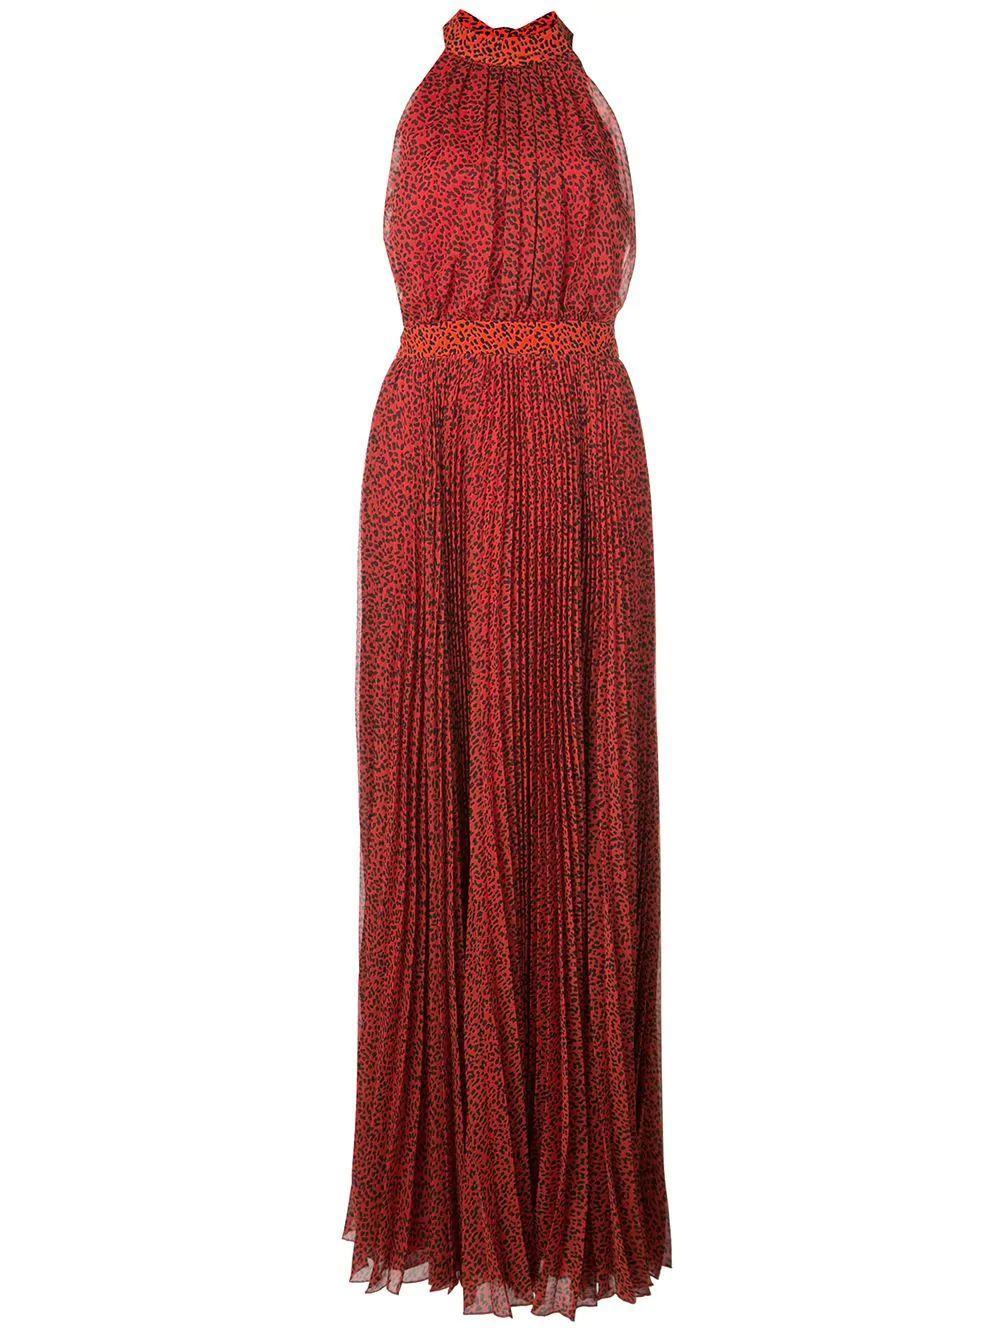 Kelissa Halter Pleat Maxi Dress Item # CC909P33515